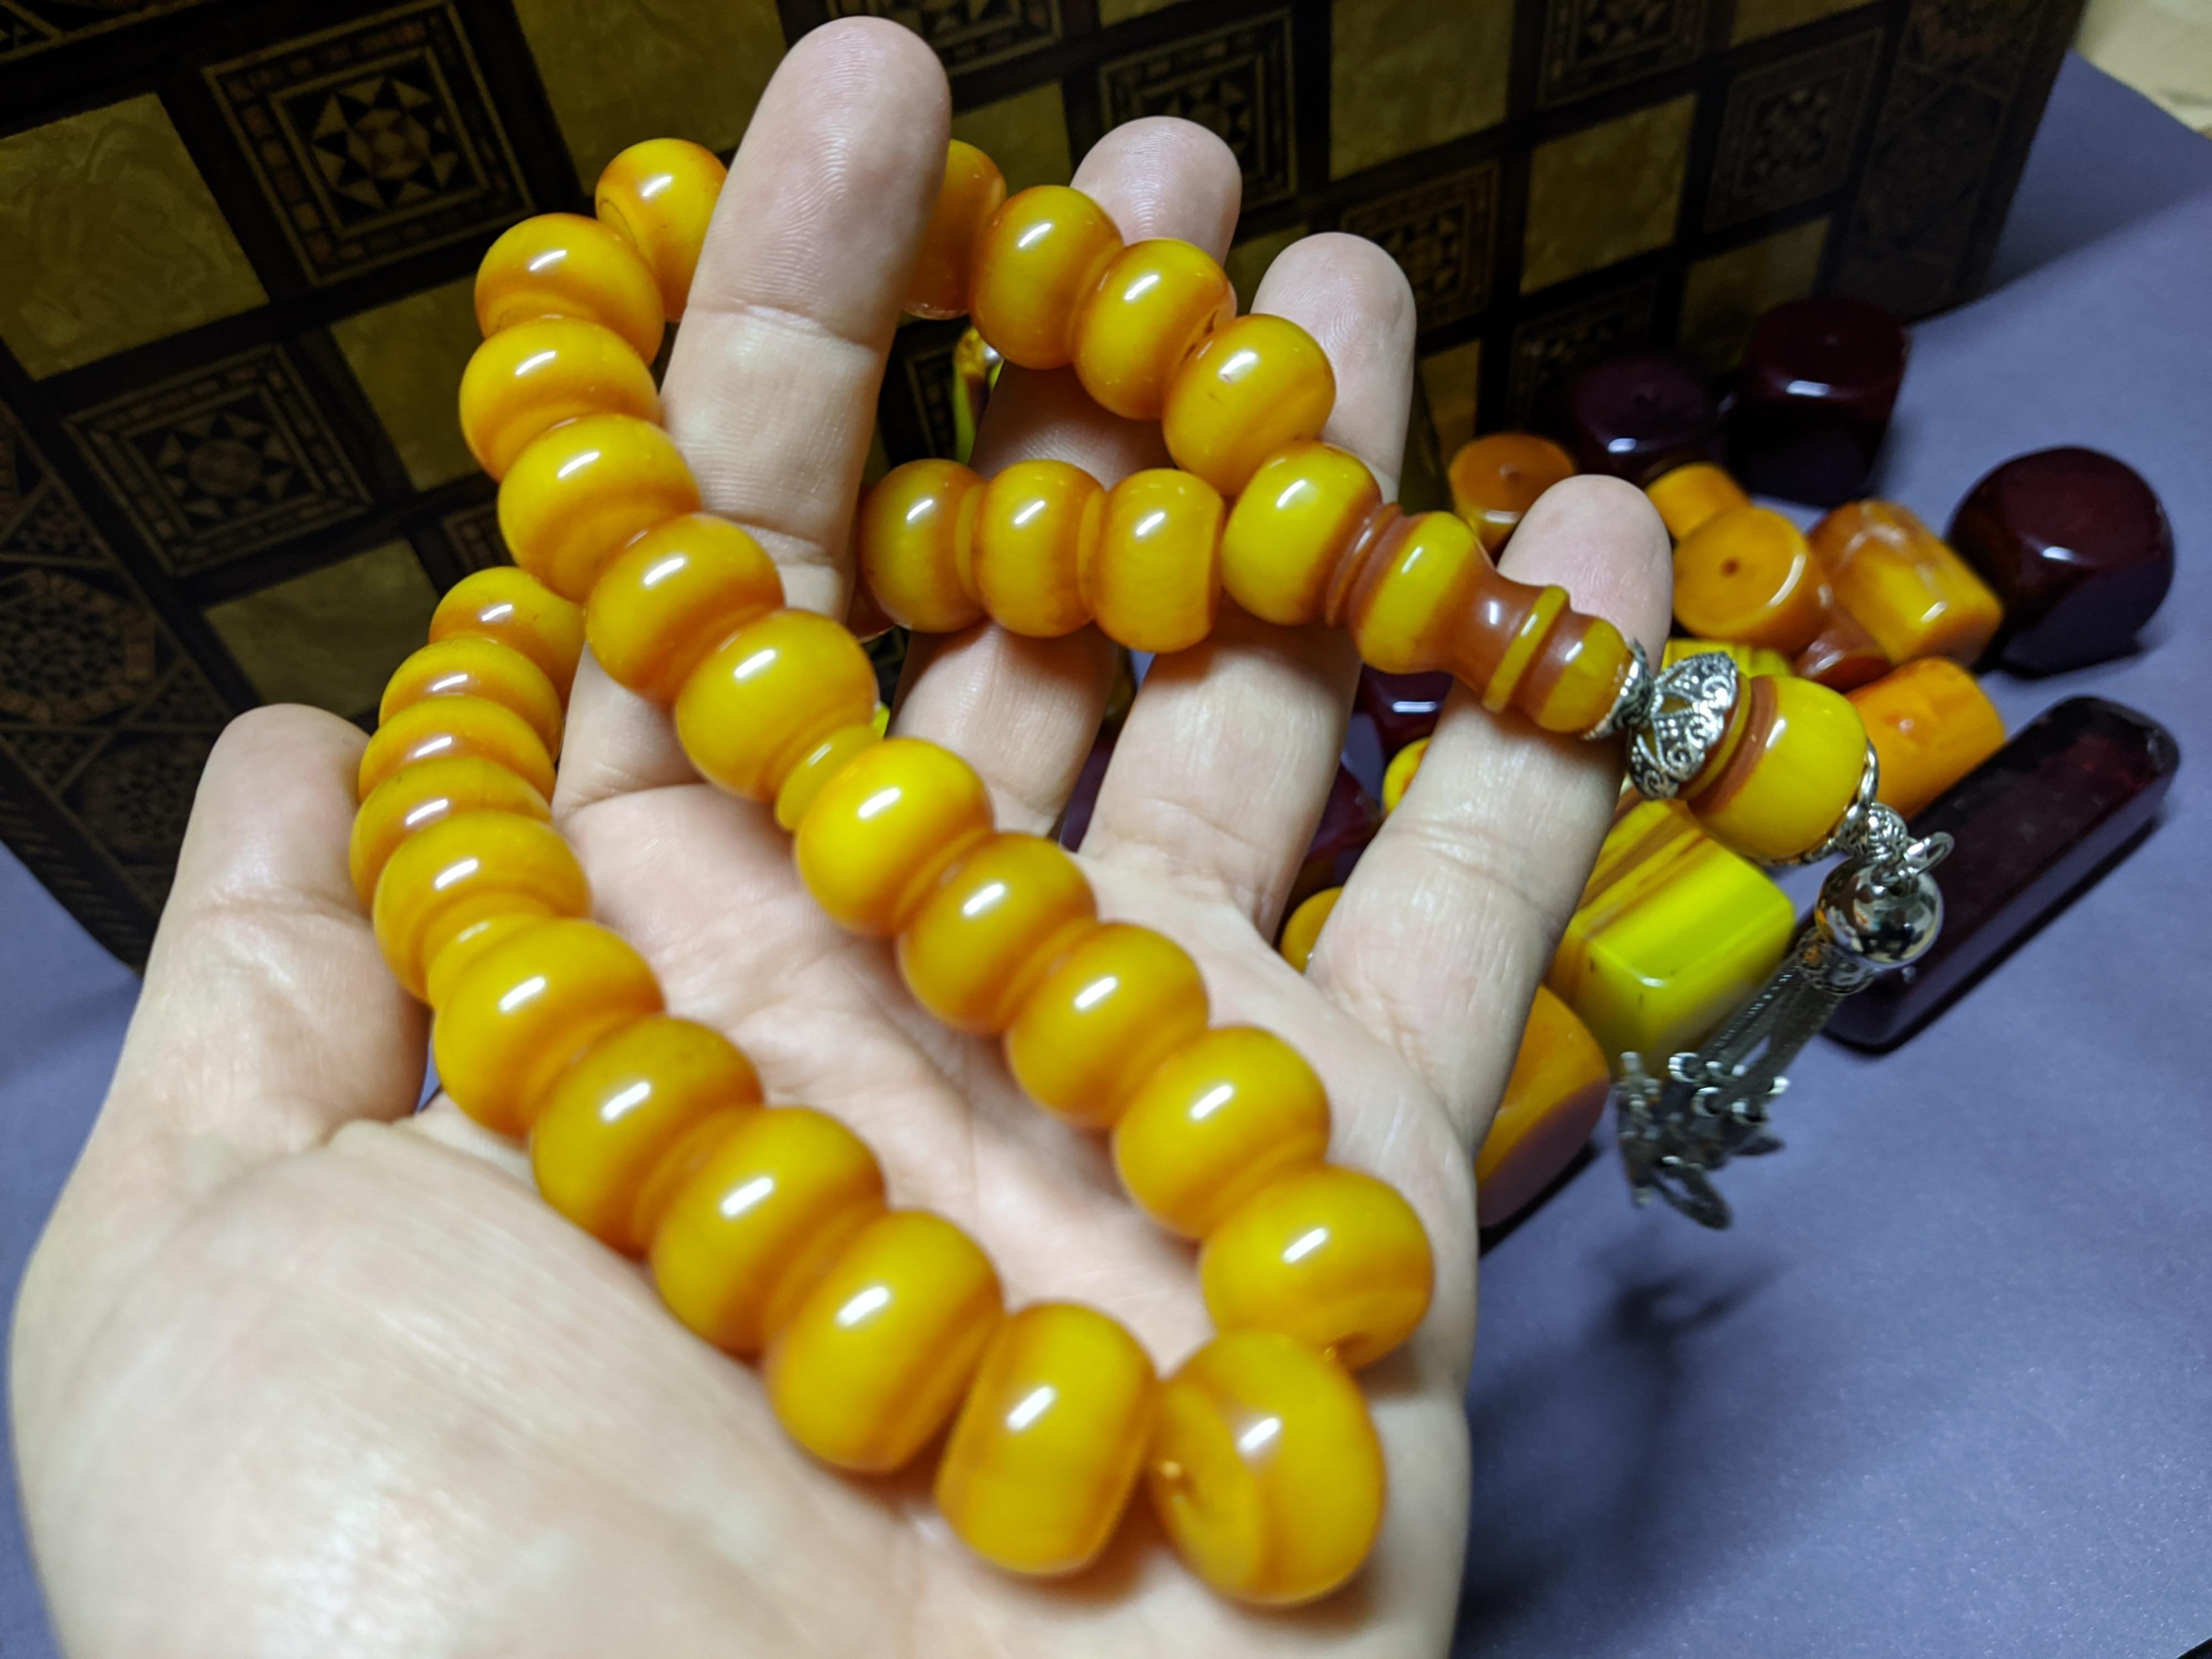 Ottoman Faturan German Amber Sandalous Misbaha Prayer Beads Islamic Gift Tasbih Tasbeeh Tasbeh Rosary Tasbih #31